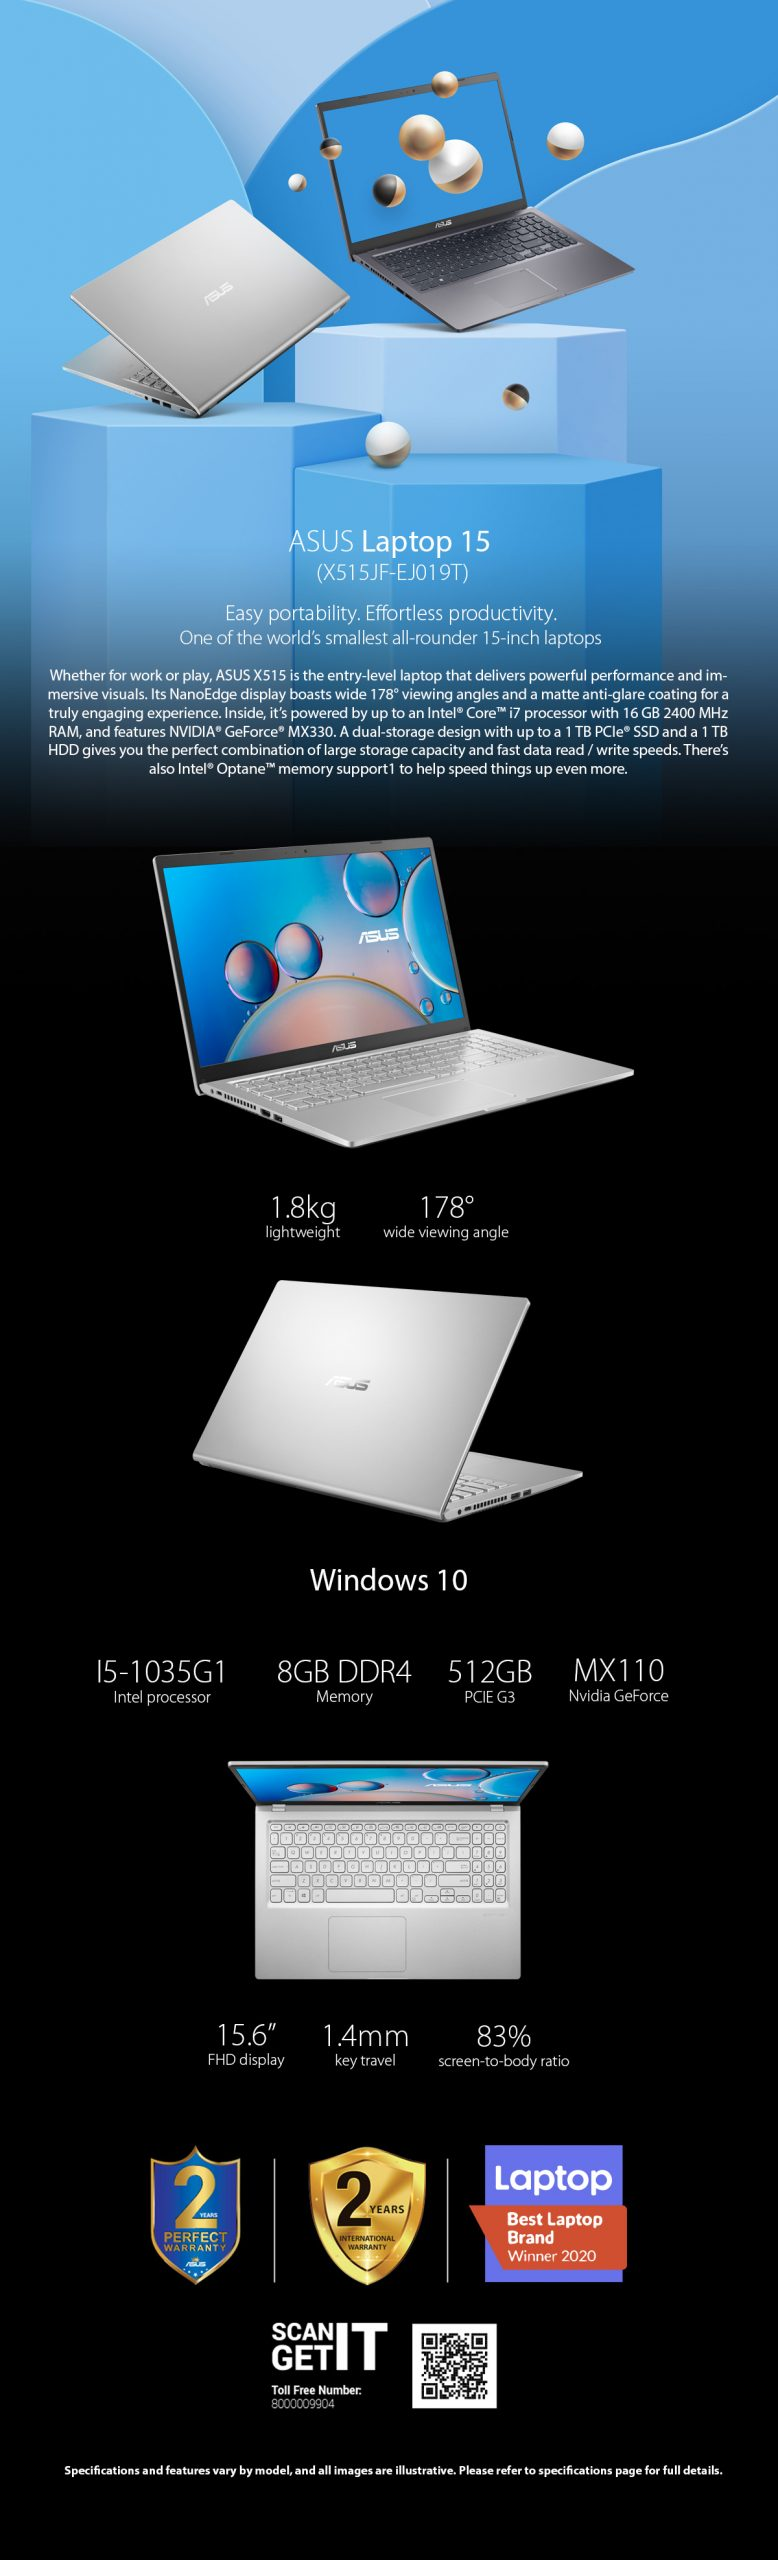 Asus Laptop X515JF-EJ019T